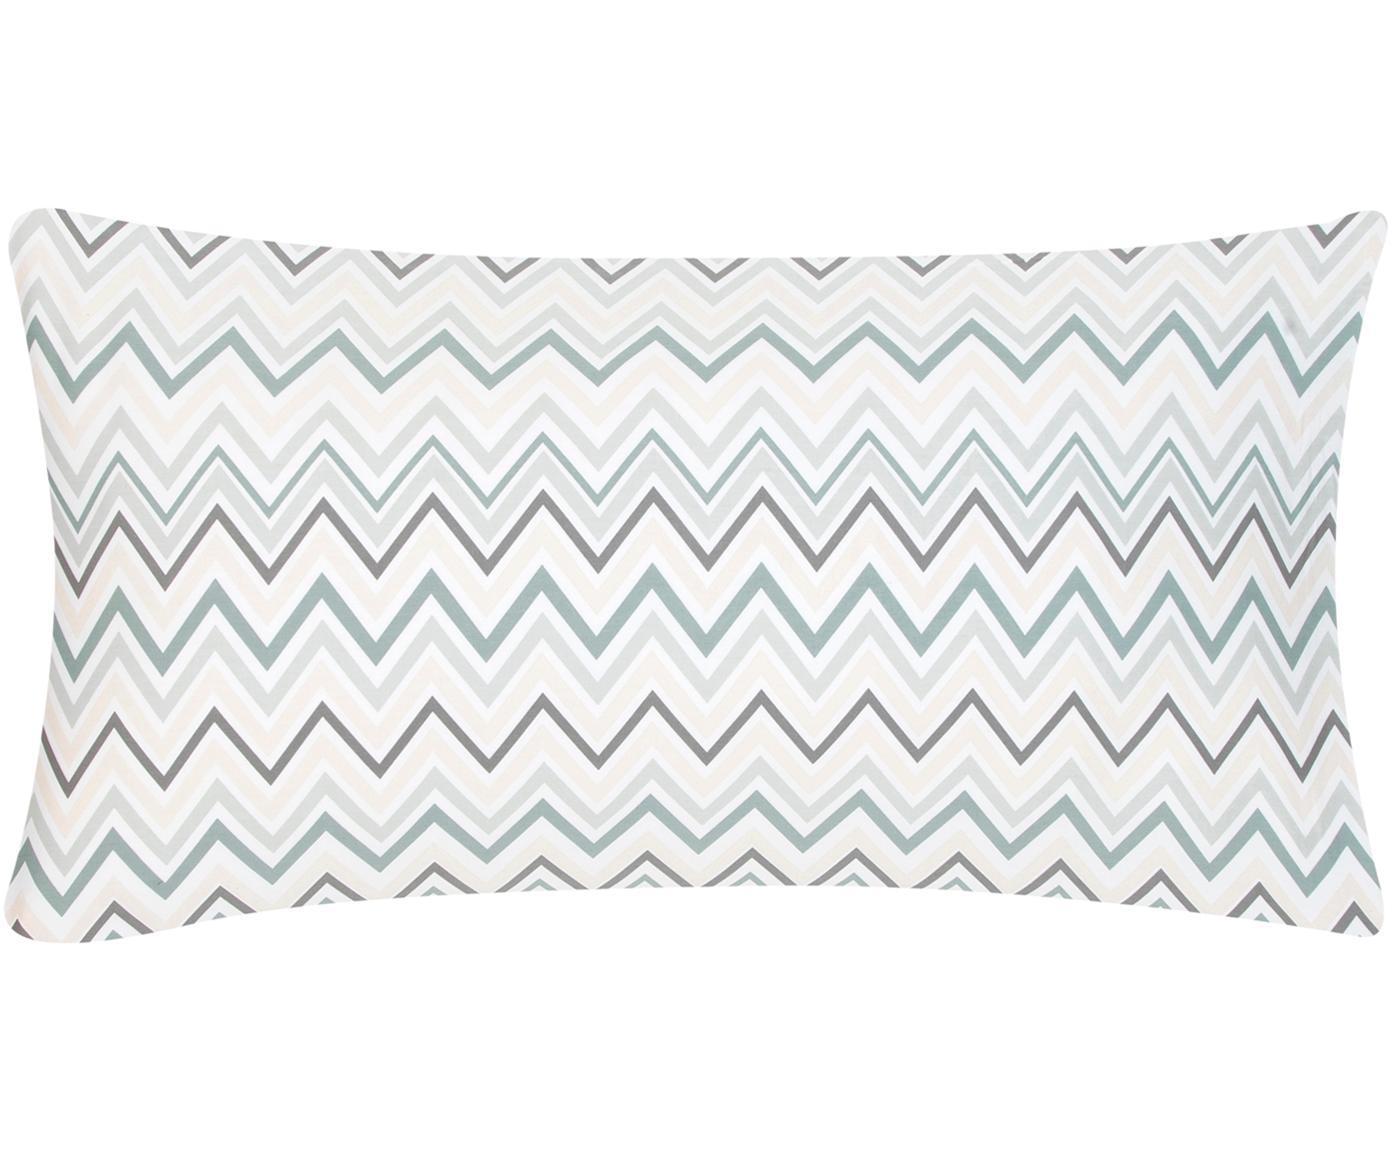 Baumwollsatin-Kissenbezüge Maui mit Zickzack-Muster, 2 Stück, Webart: Satin Fadendichte 200 TC,, Weiß, Grün, 40 x 80 cm